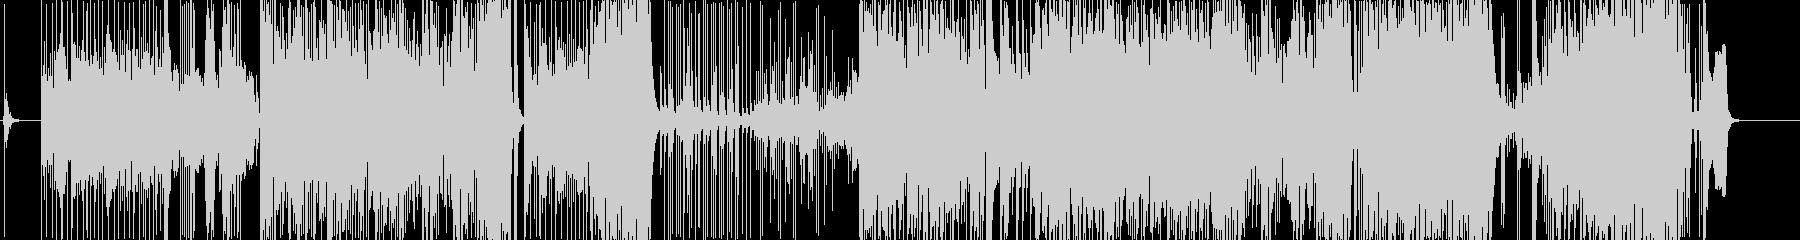 AZUMAの未再生の波形